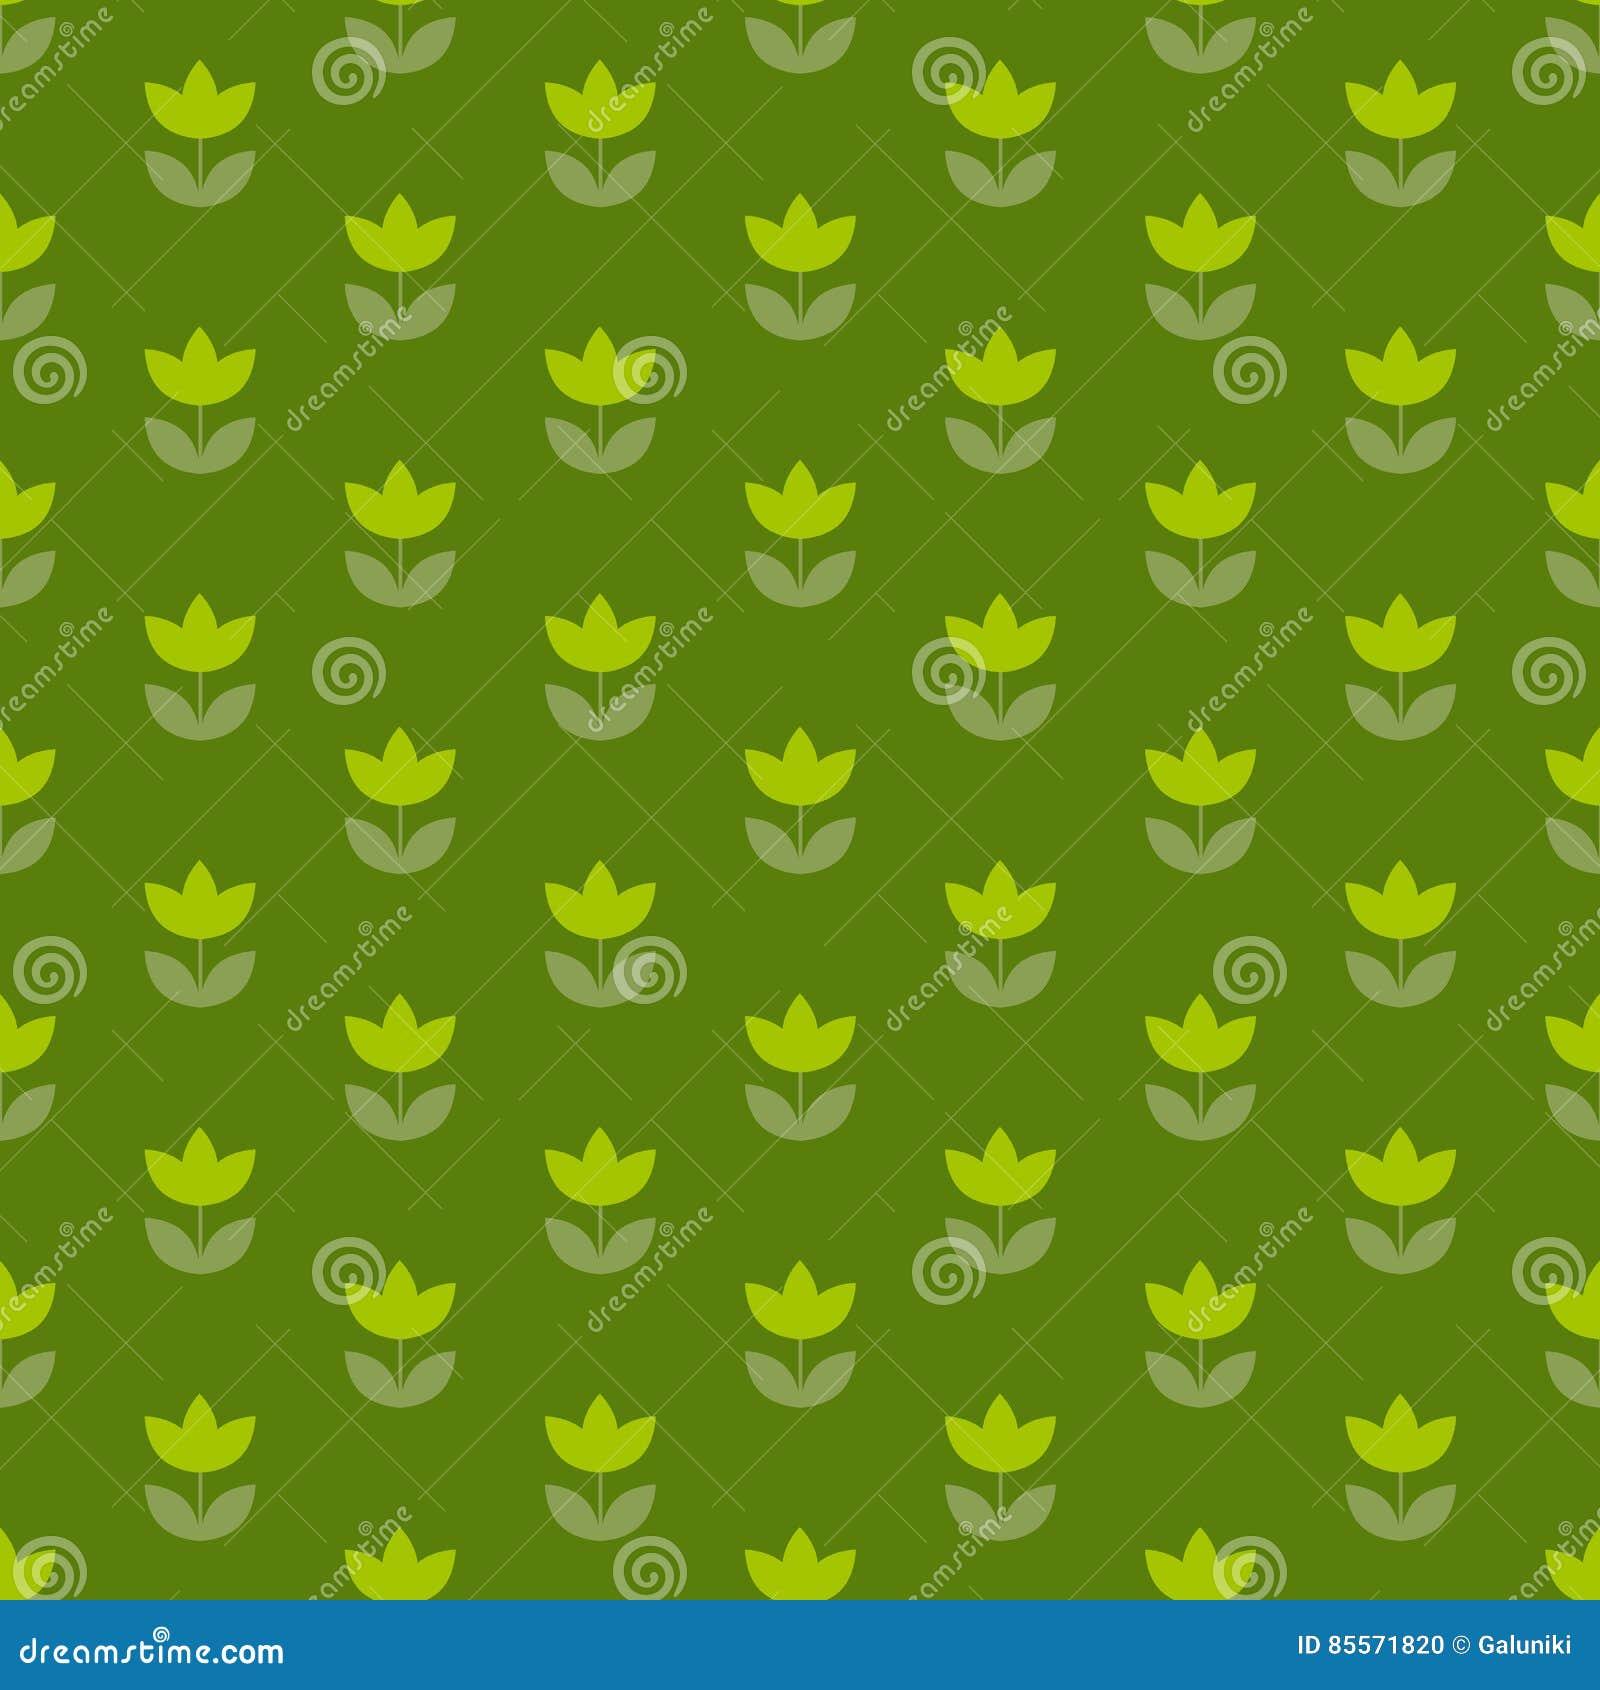 Holland-Tulpe grüne Farbe des Grases wiederholbares Motiv